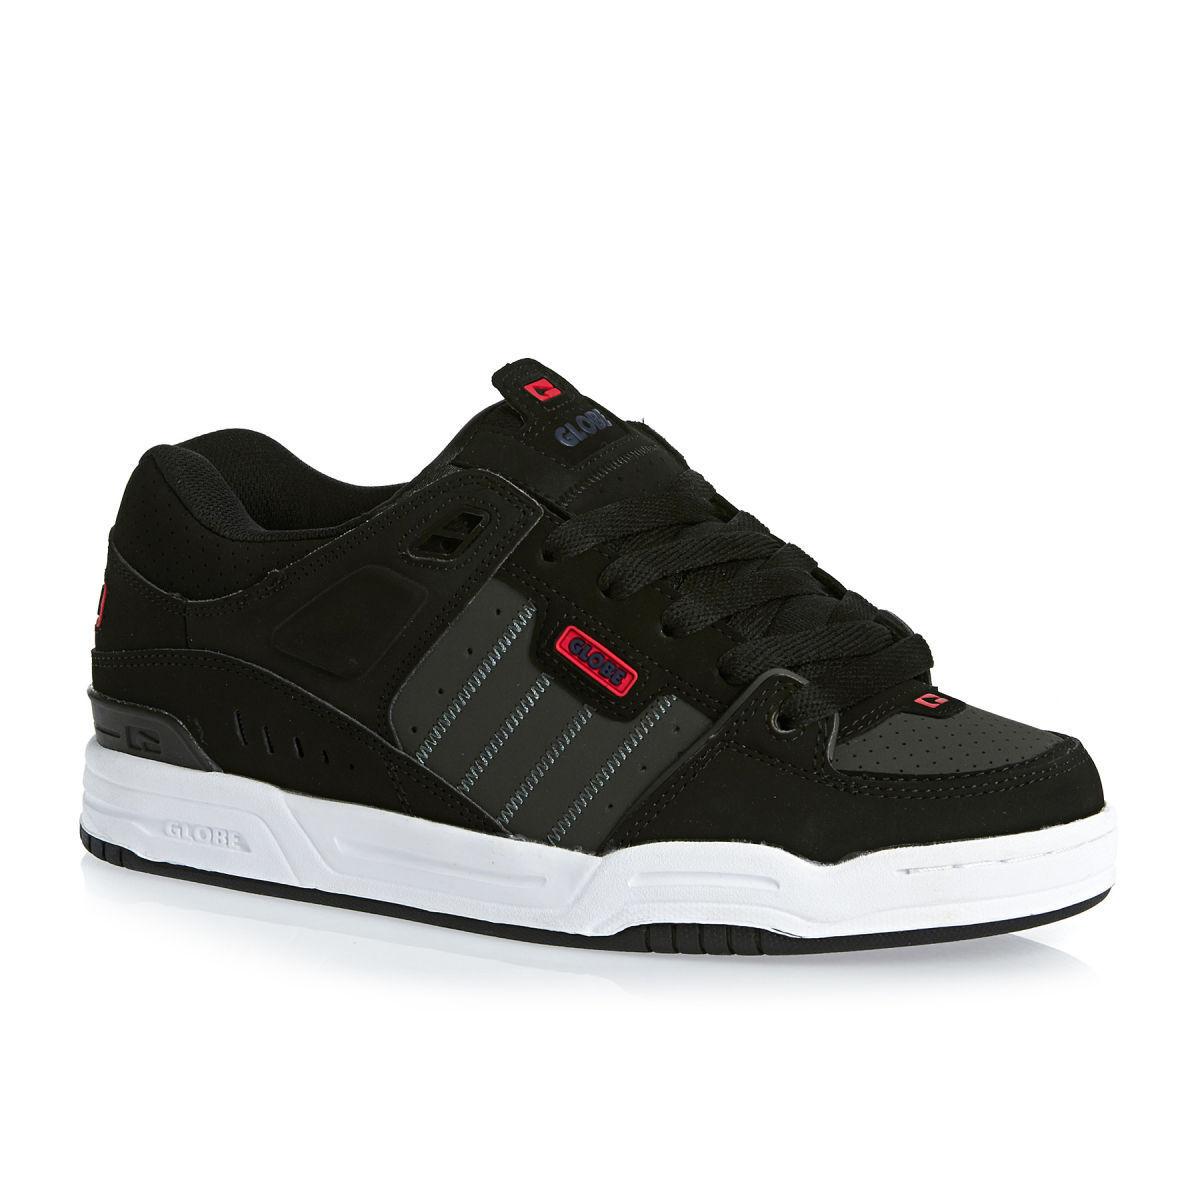 Zapatillas Skate Skate Skate Globe Zapatos FUSION Negro Noche Rojo Zapatos Hombre Mujer d5963a